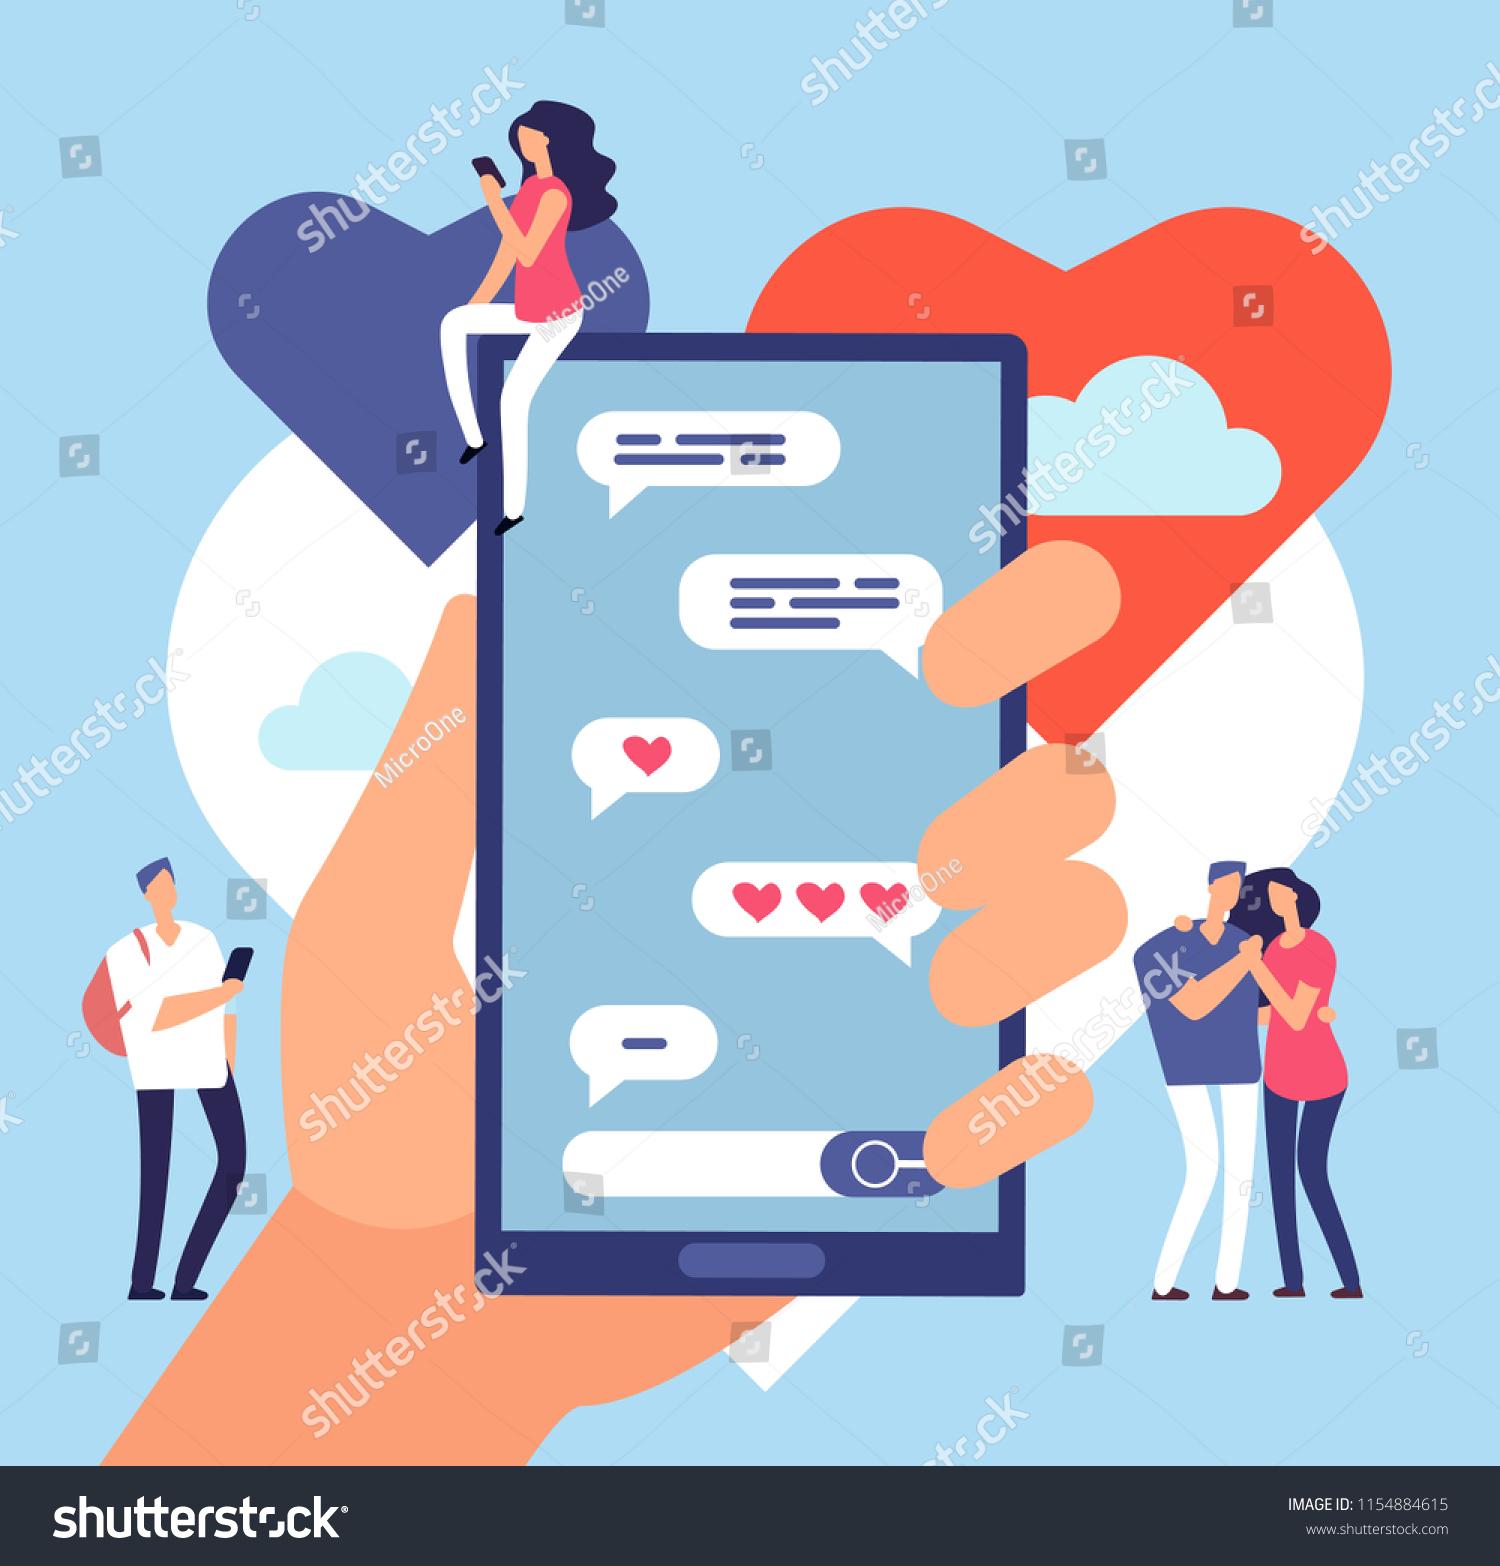 Online kid dating sites